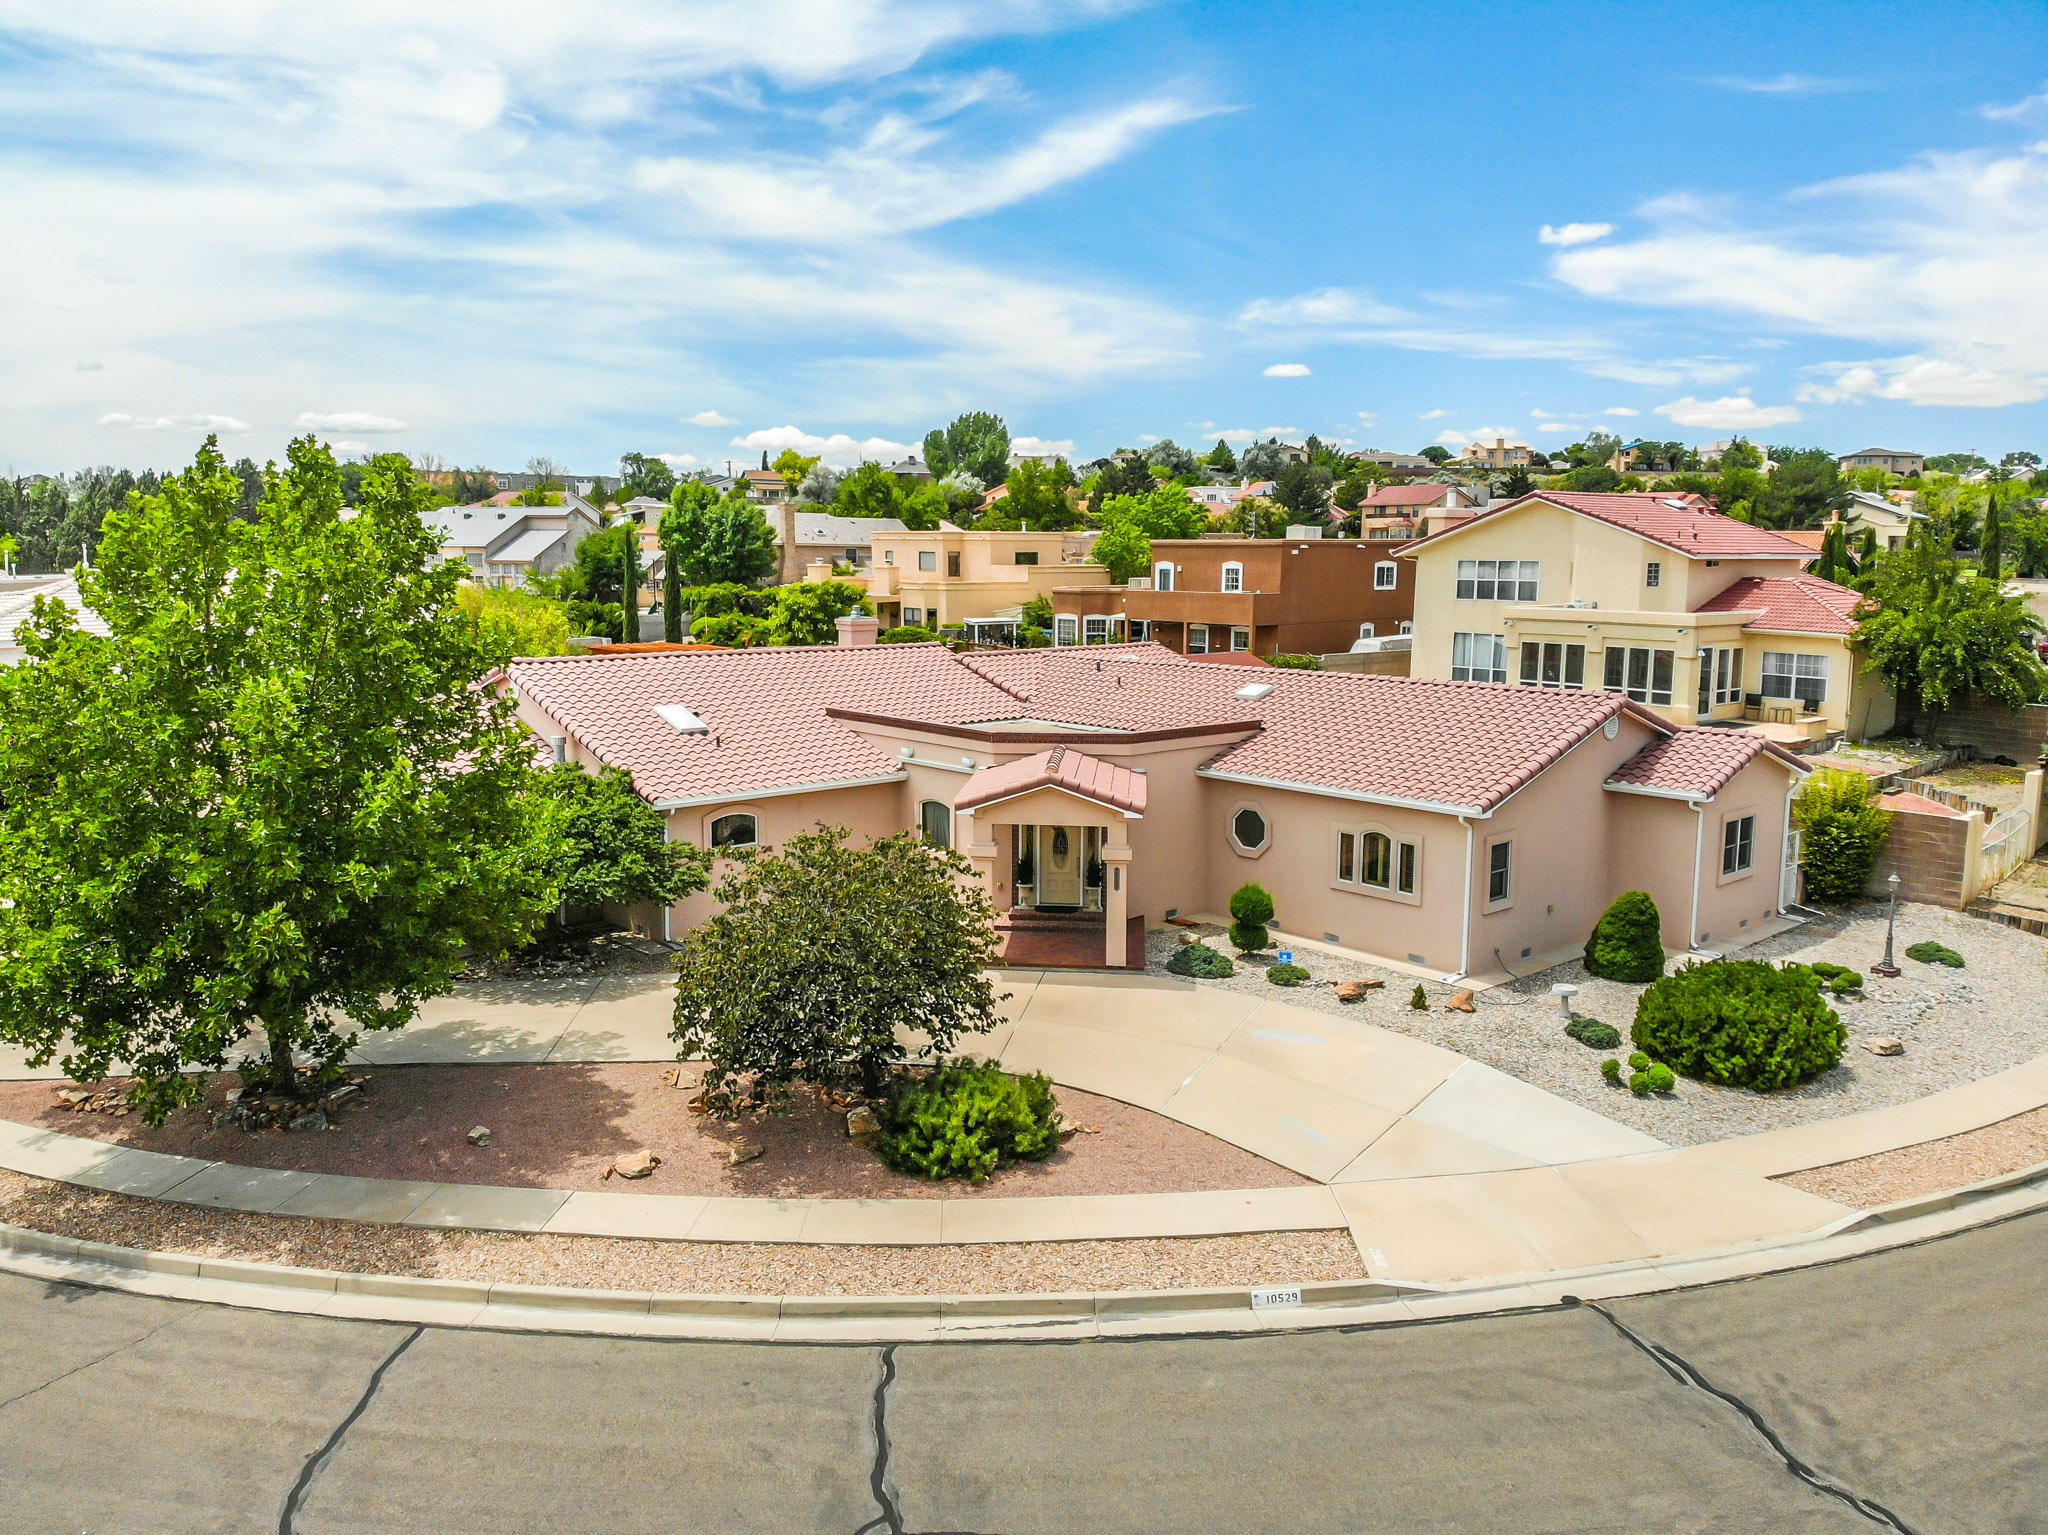 10529 NW Calle Alba, Northwest Albuquerque and Northwest Heights, New Mexico